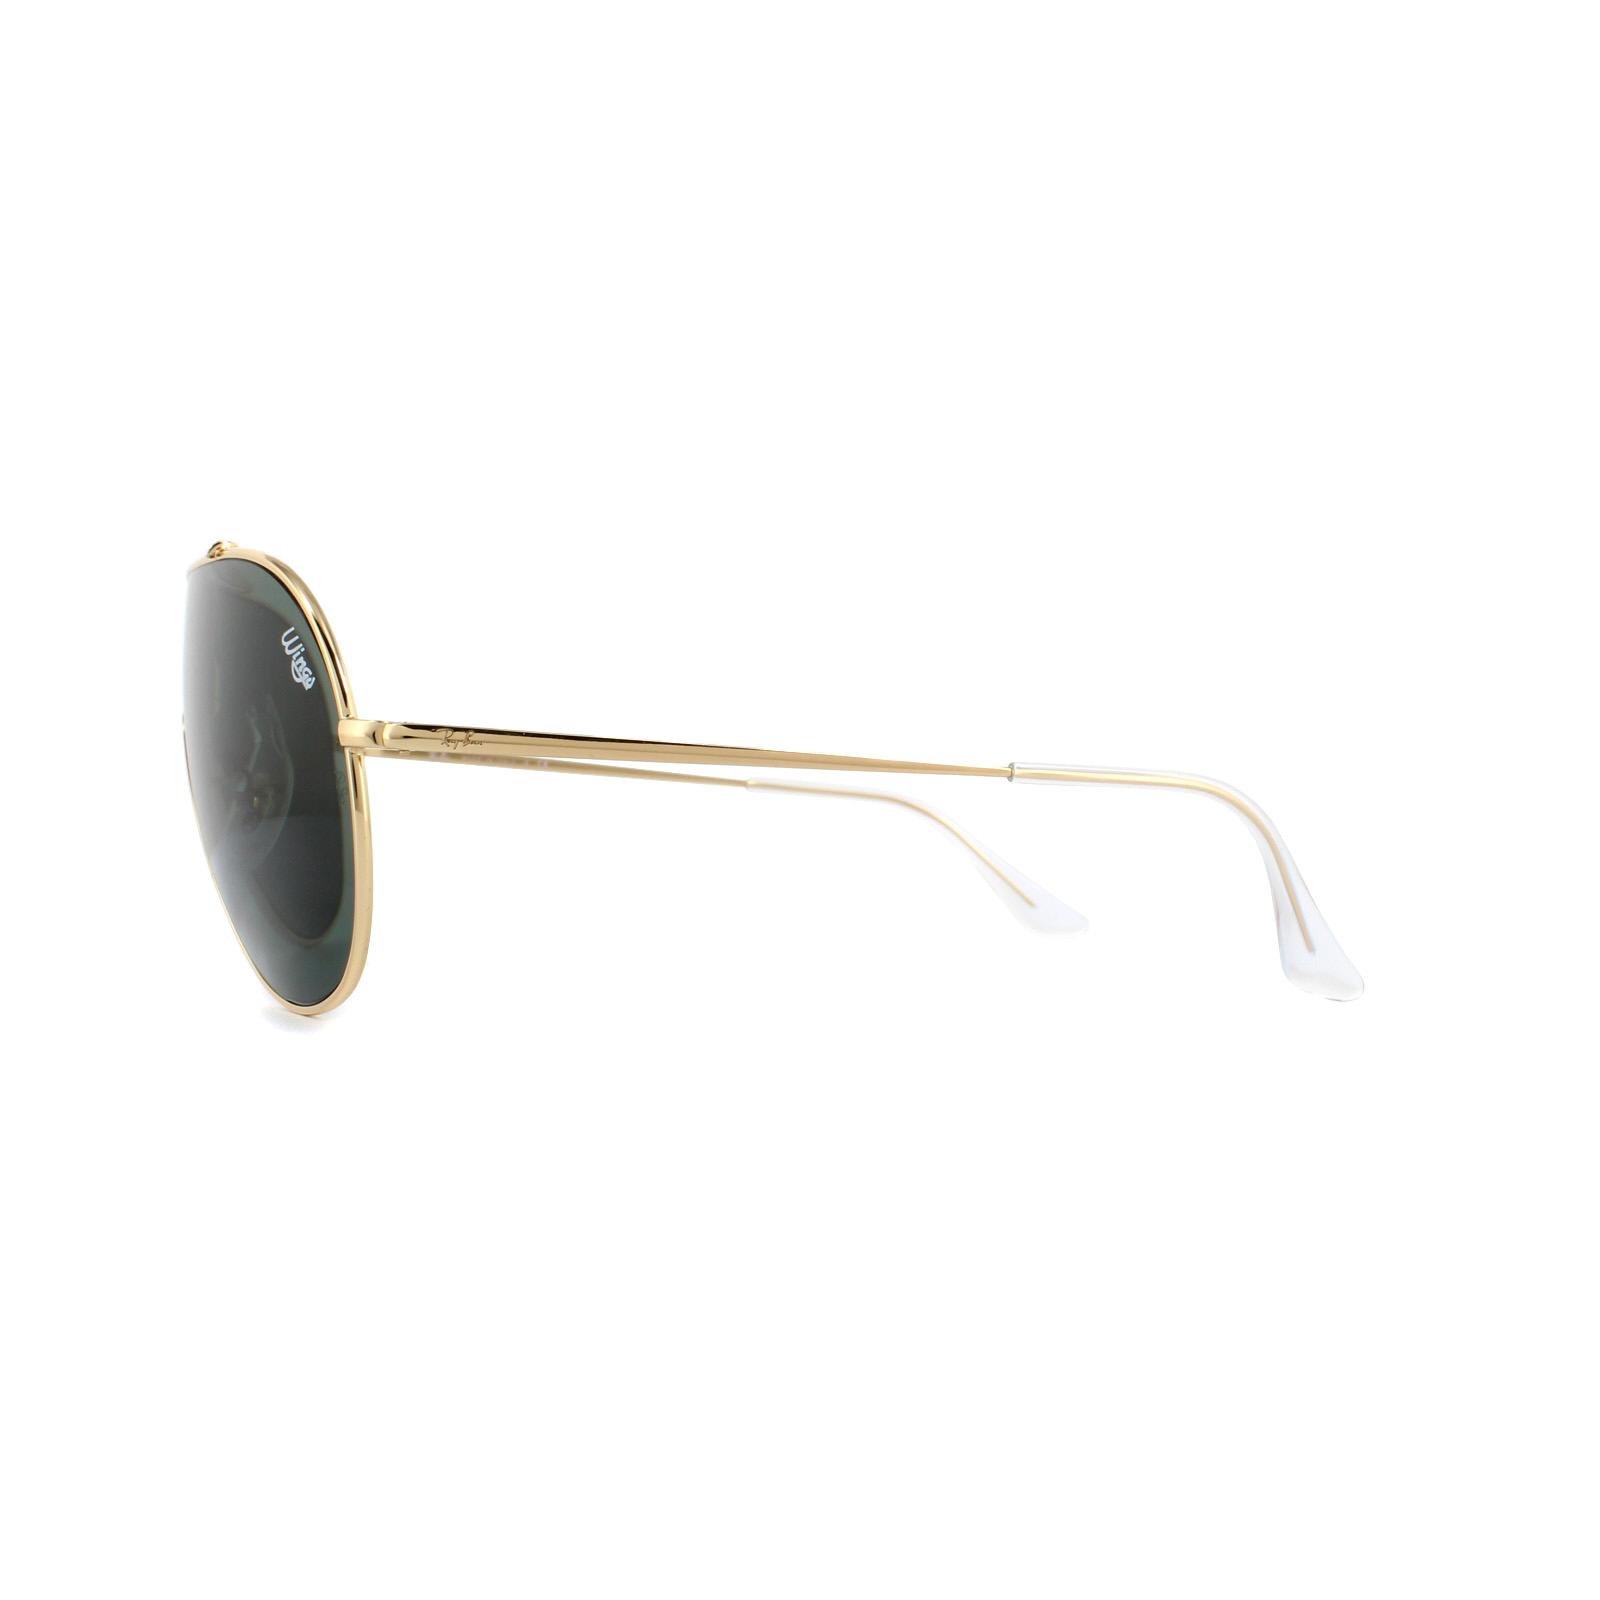 344ed638cc6 Ray-Ban Sunglasses Wings RB3597 905071 Gold Dark Green 8053672919523 ...